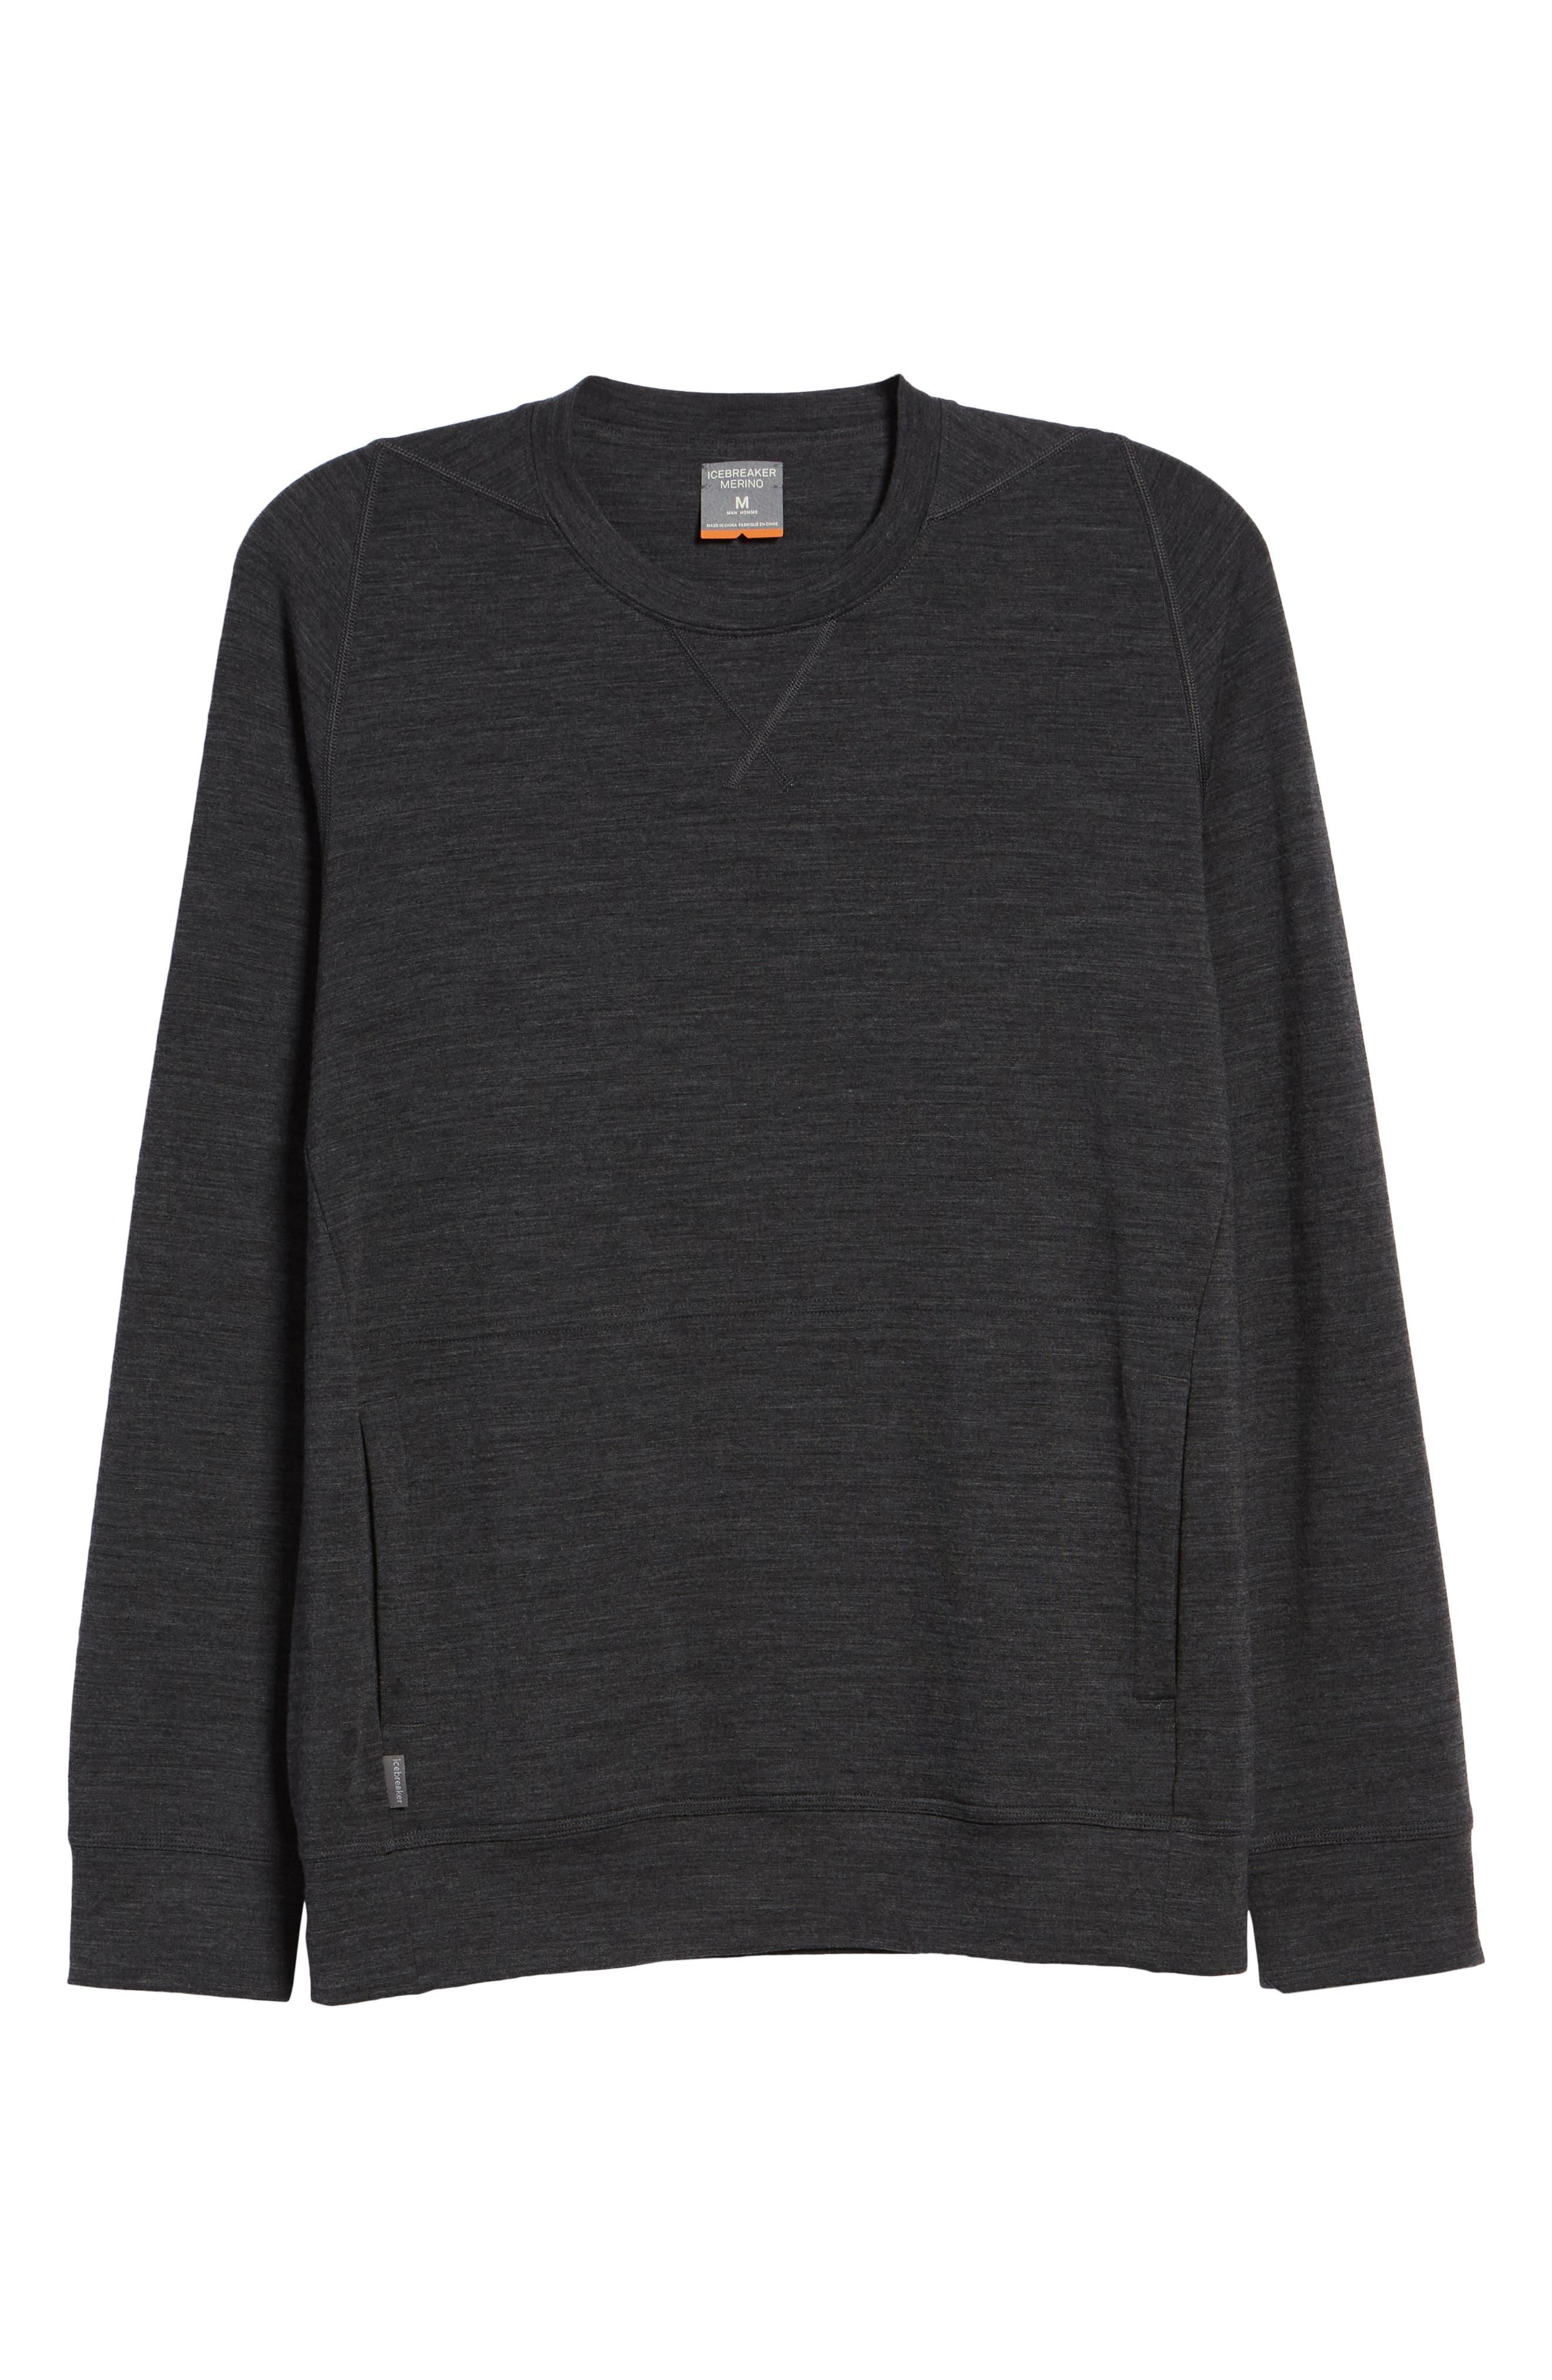 Shifter Merino Wool Blend Crewneck Sweater,                             Alternate thumbnail 6, color,                             JET HEATHER